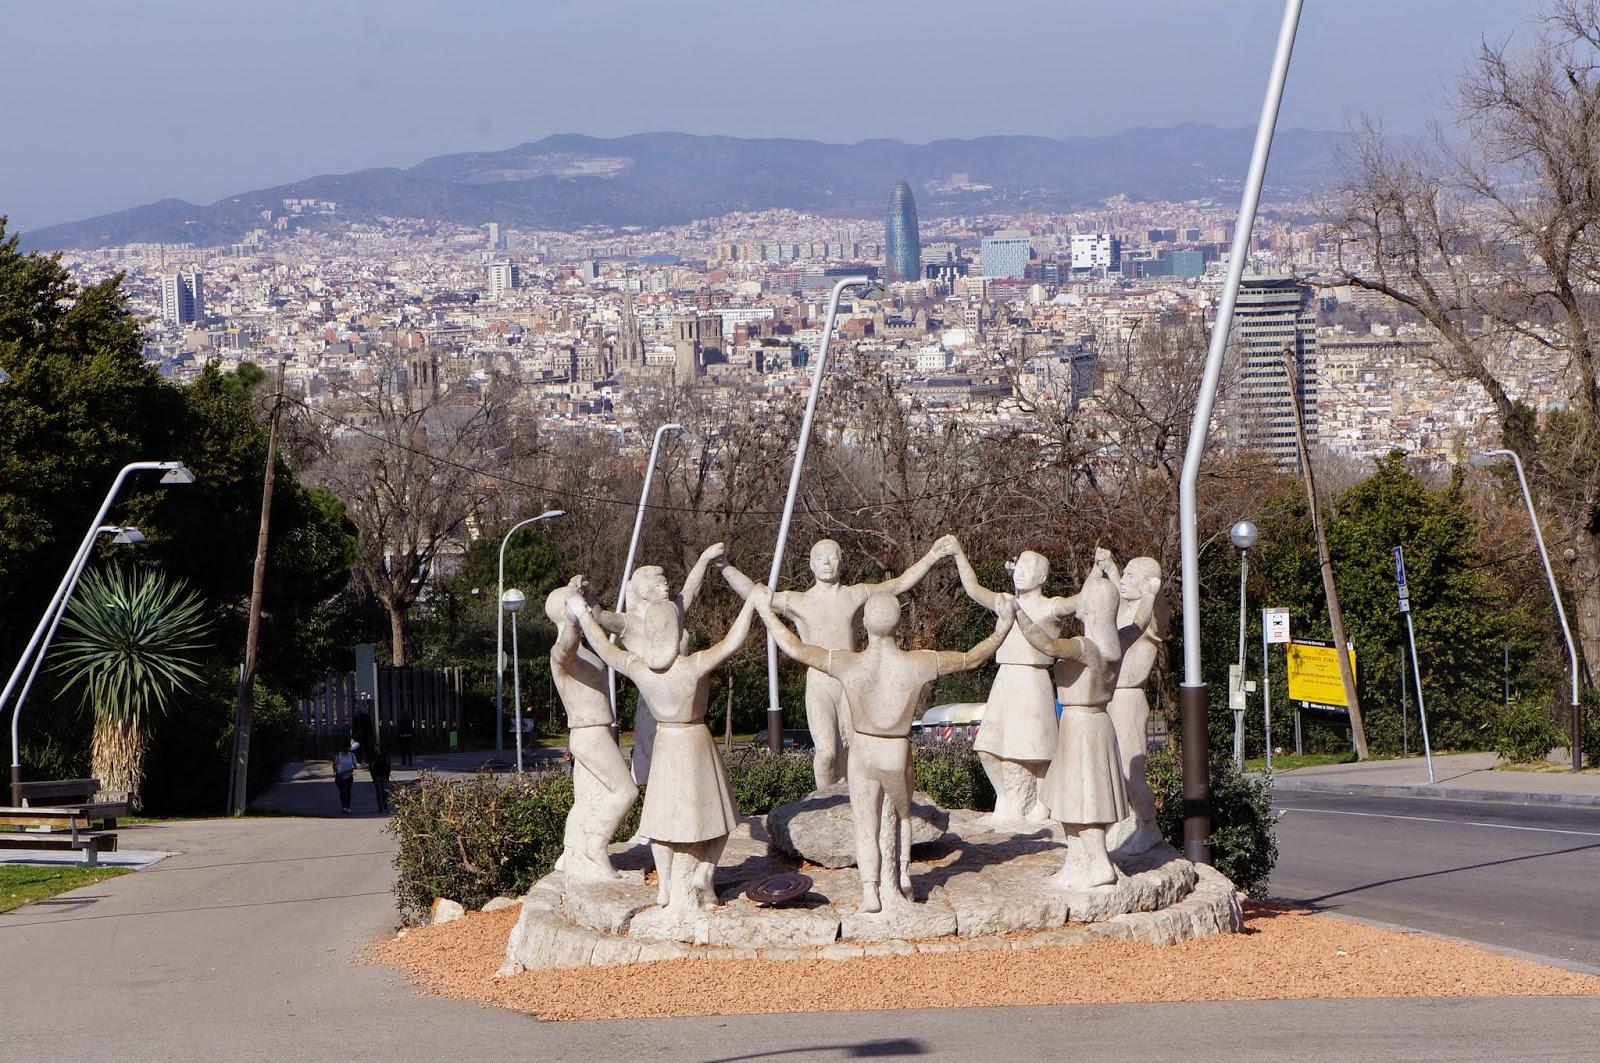 Fun and joyful statues in Barcelona Spain.